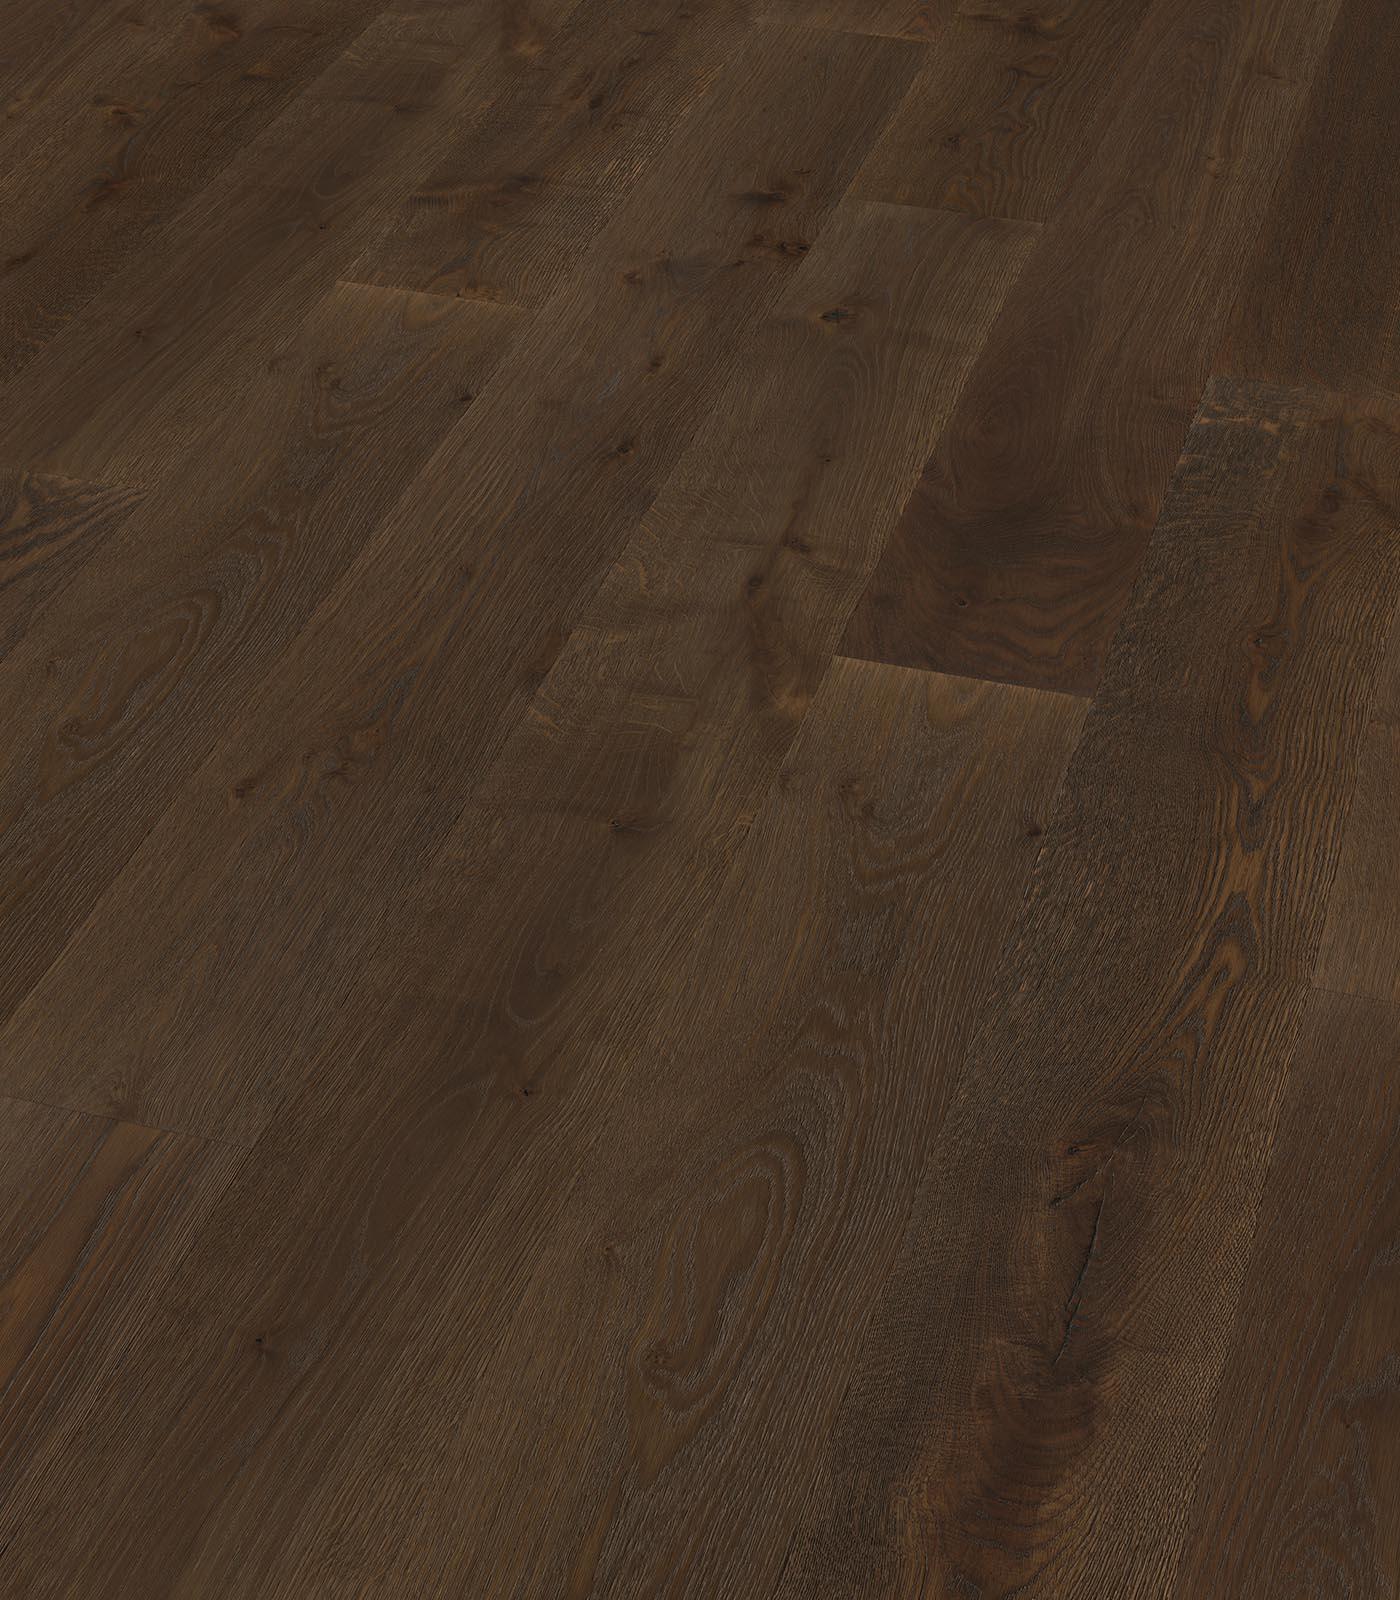 Costa Rica-Lifestyle Collection- European Oak Floors-angle